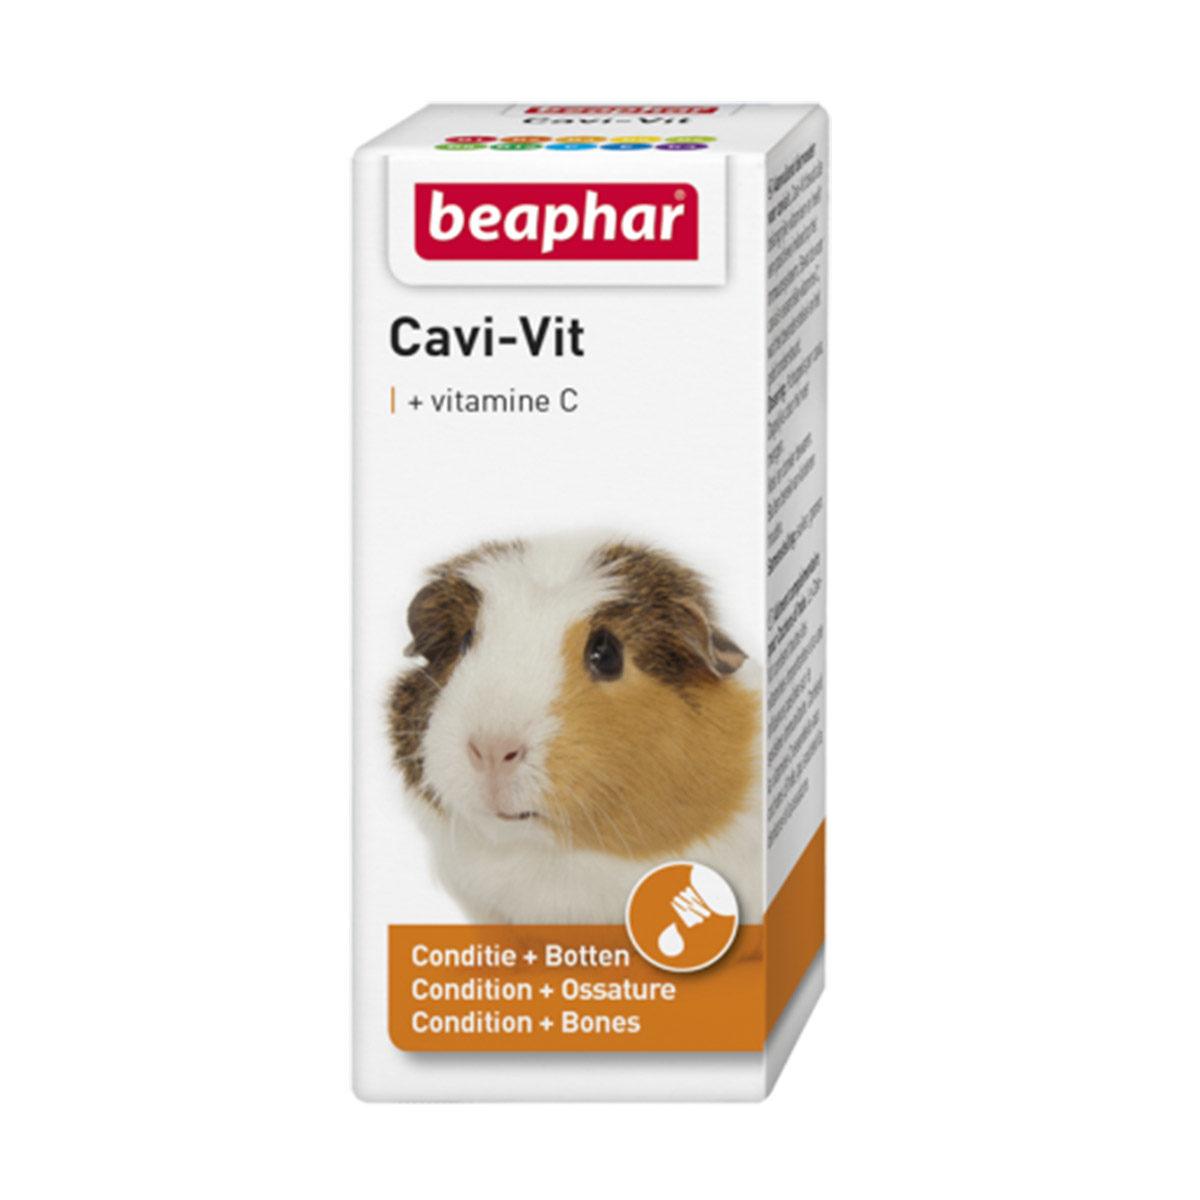 Beaphar Cavi-Vit Multivitamin 50 ml - in Knaagdieren